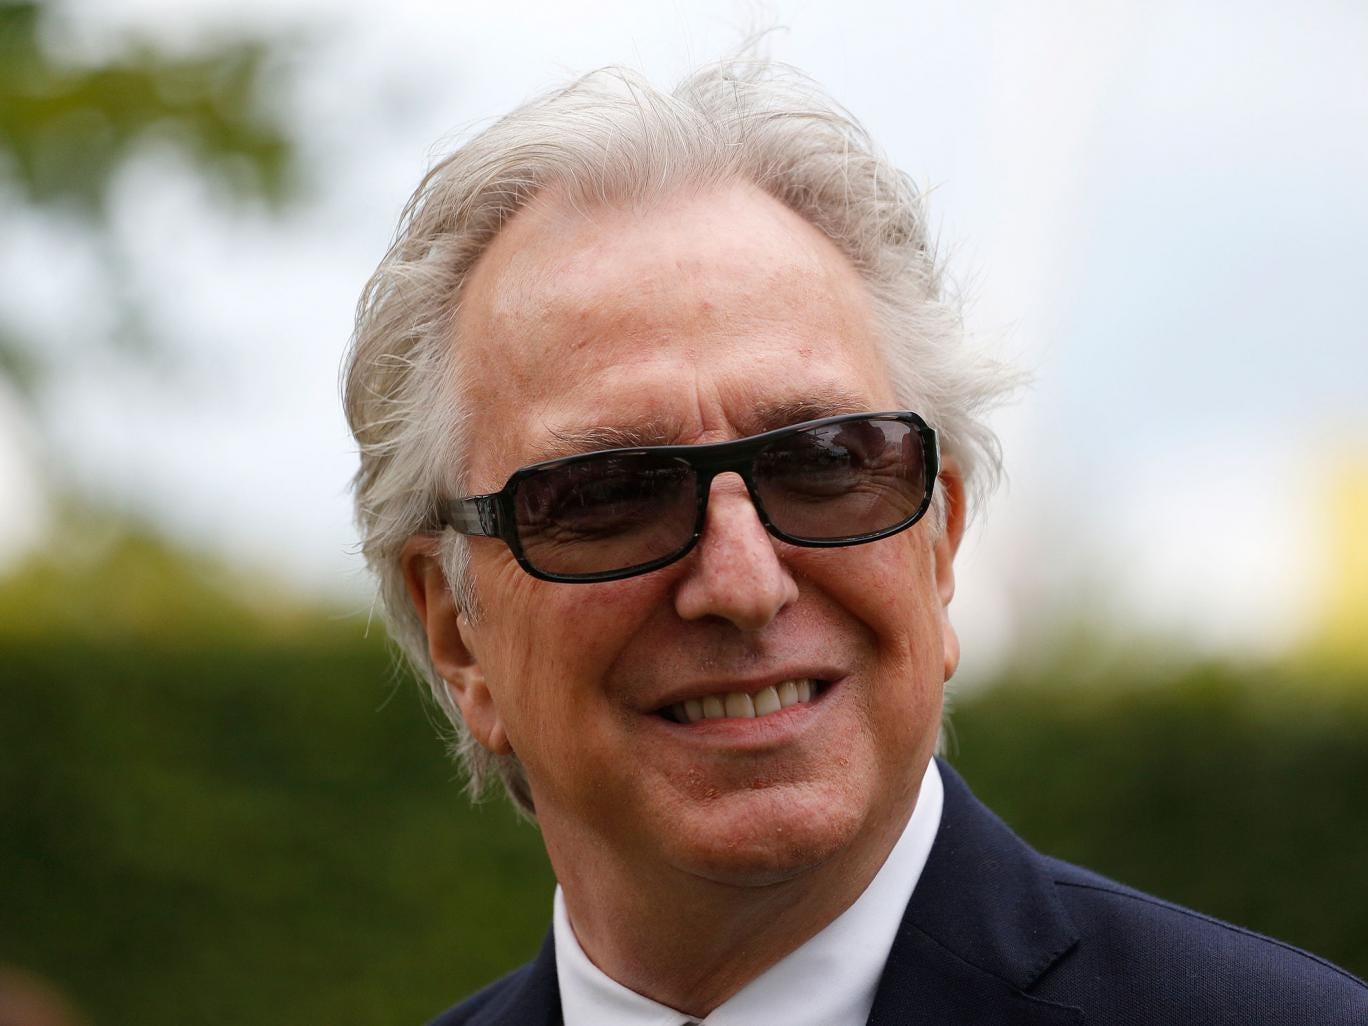 Alan Rickmann